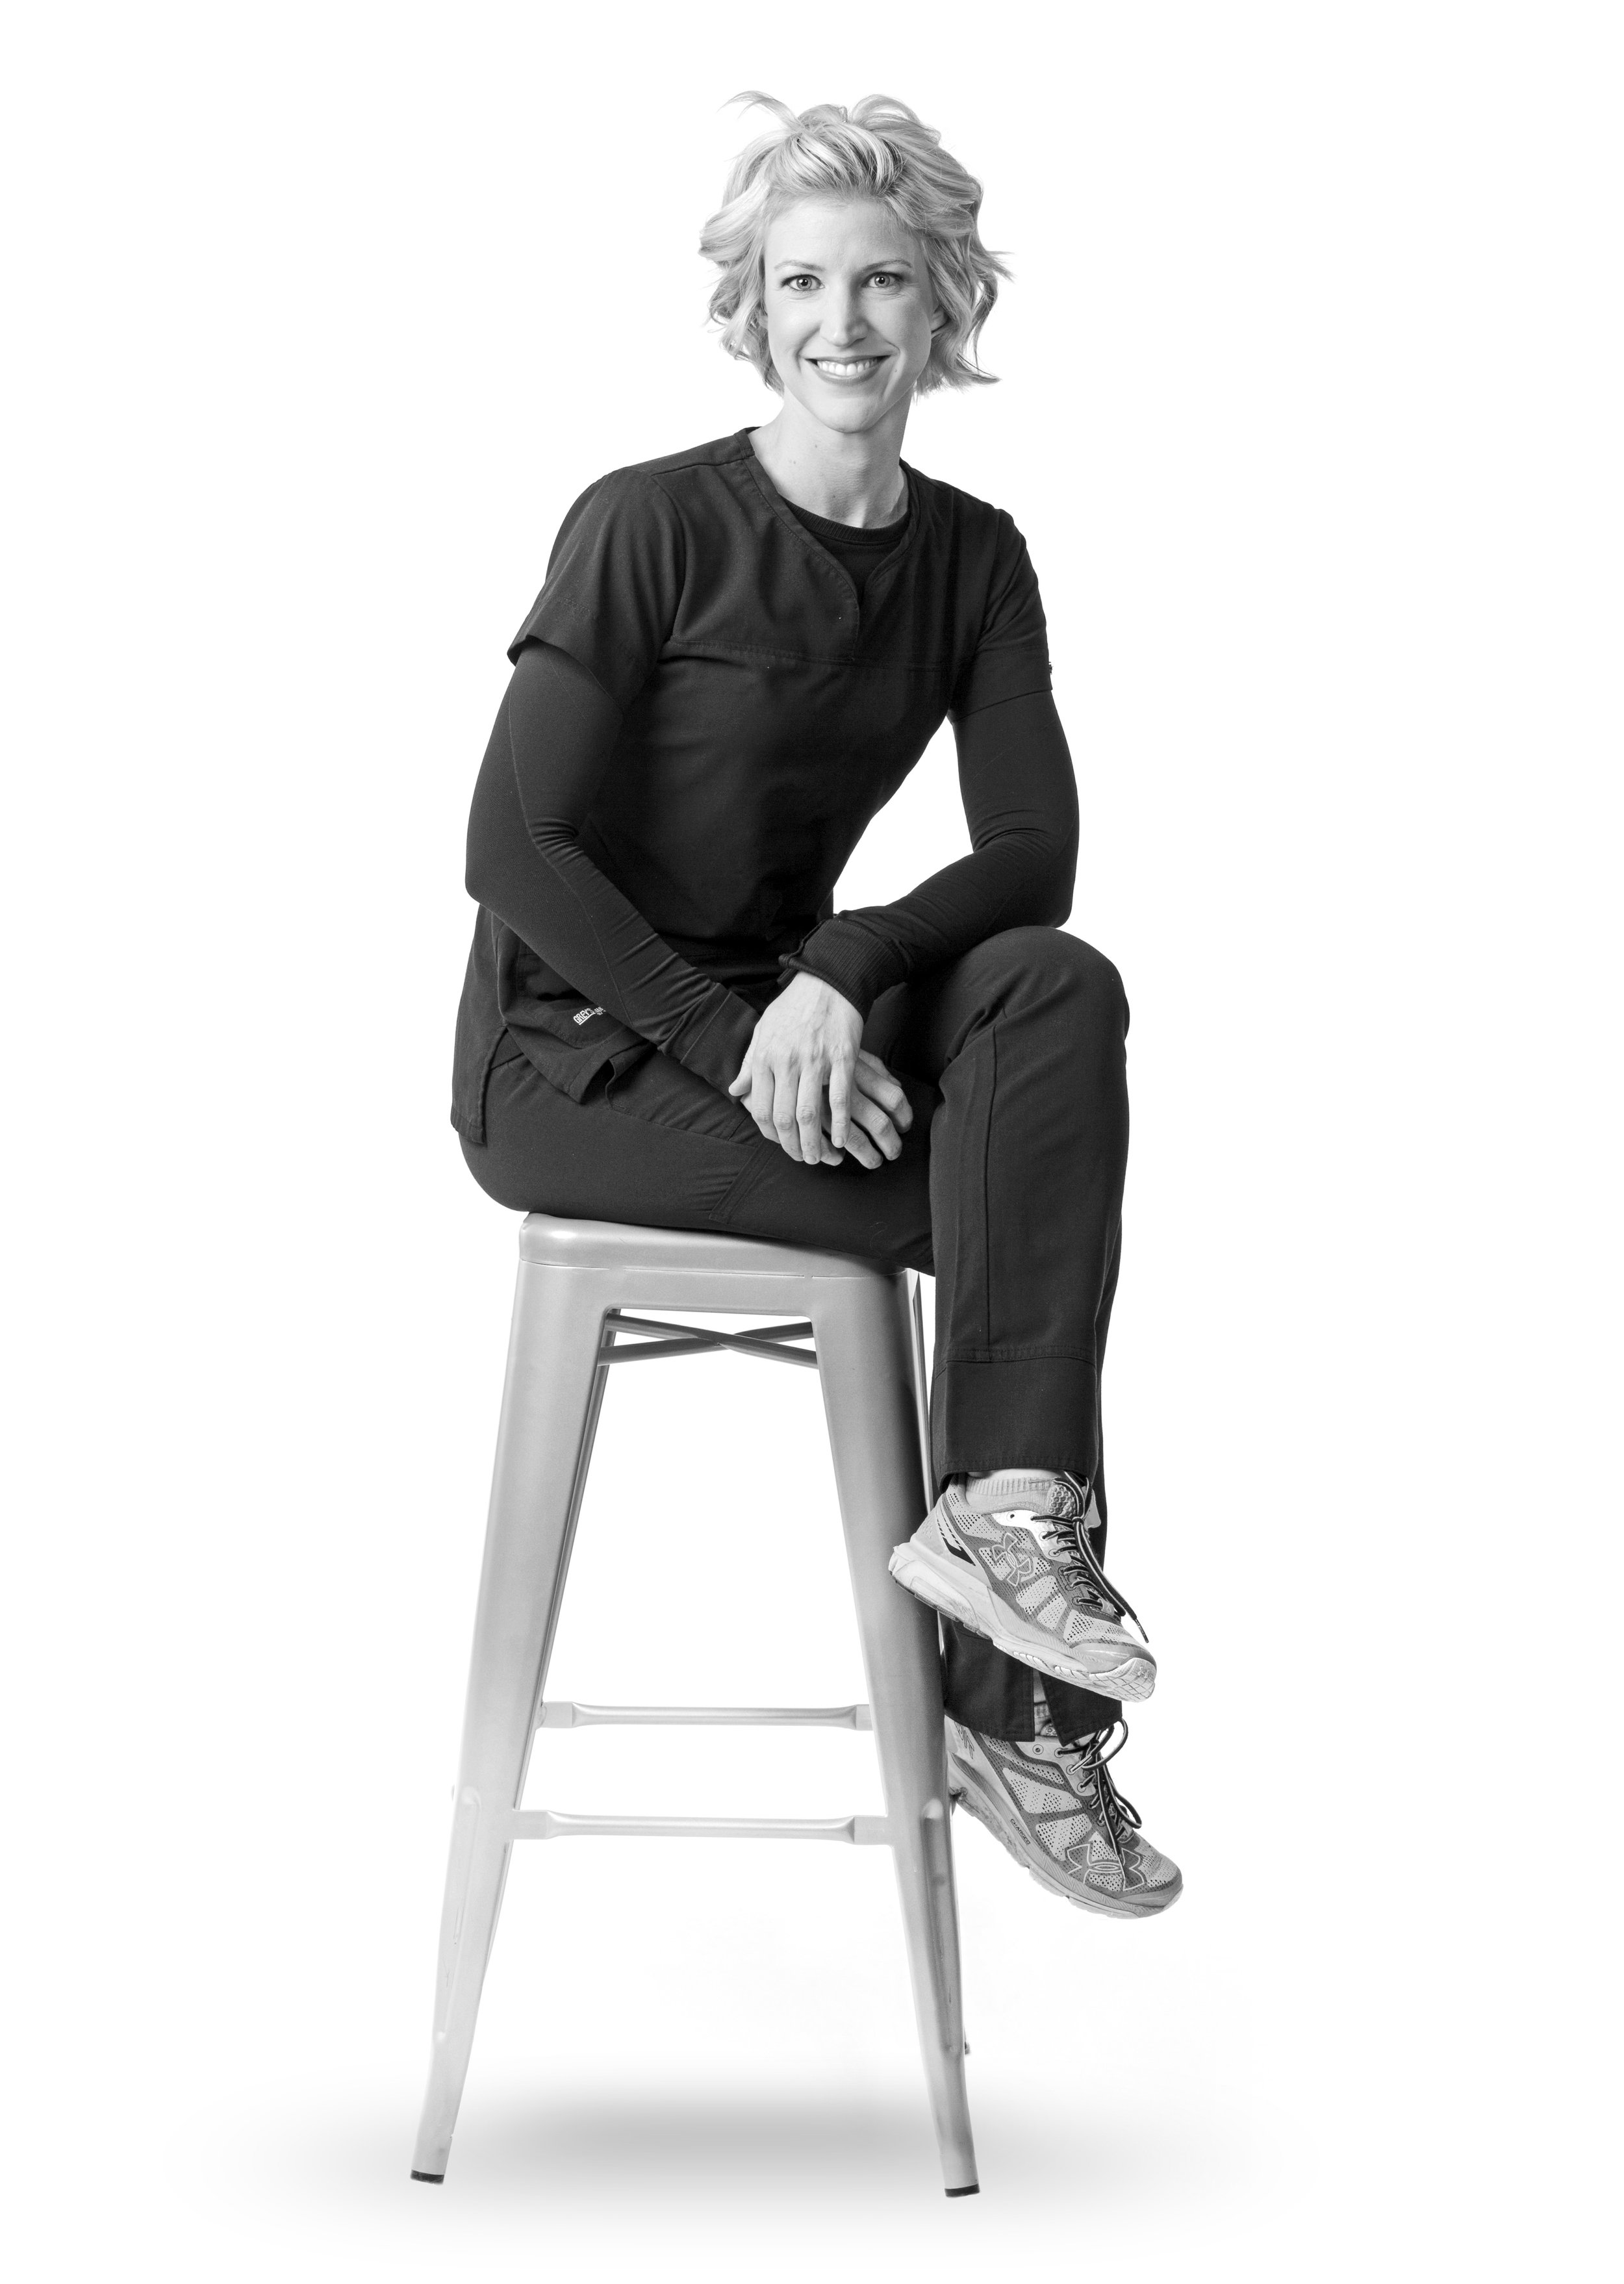 Julie Klug